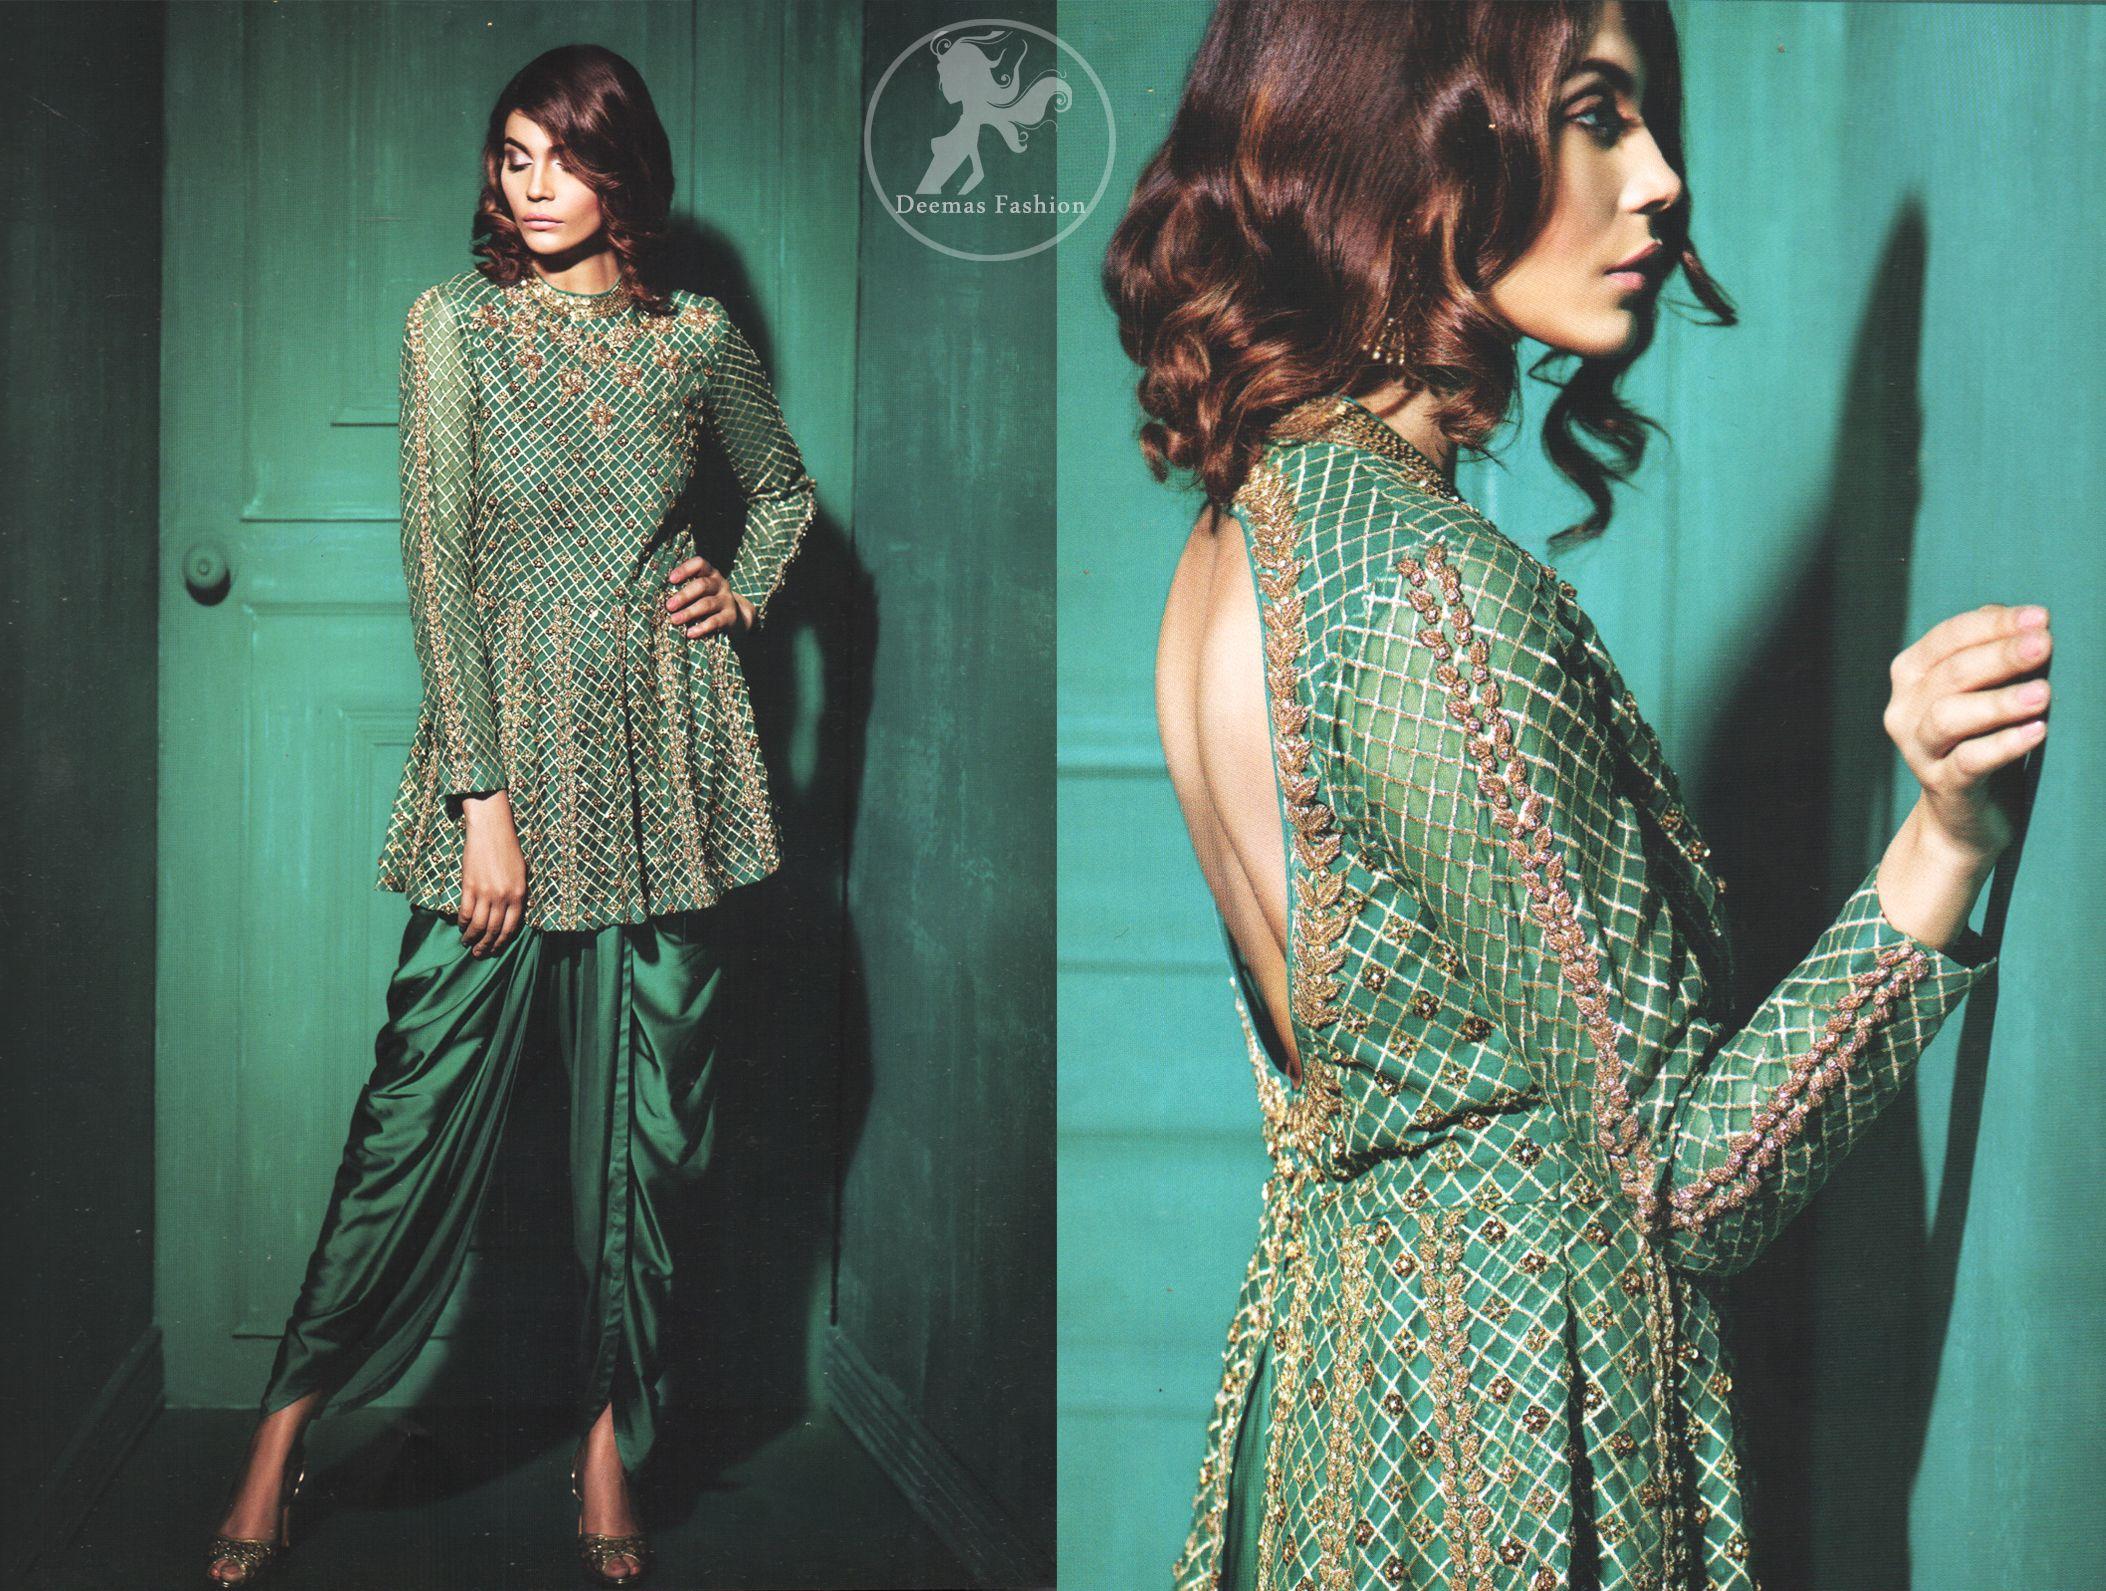 Party Wear Teal Green Peplum with Silky Tulip Net Dupatta ...